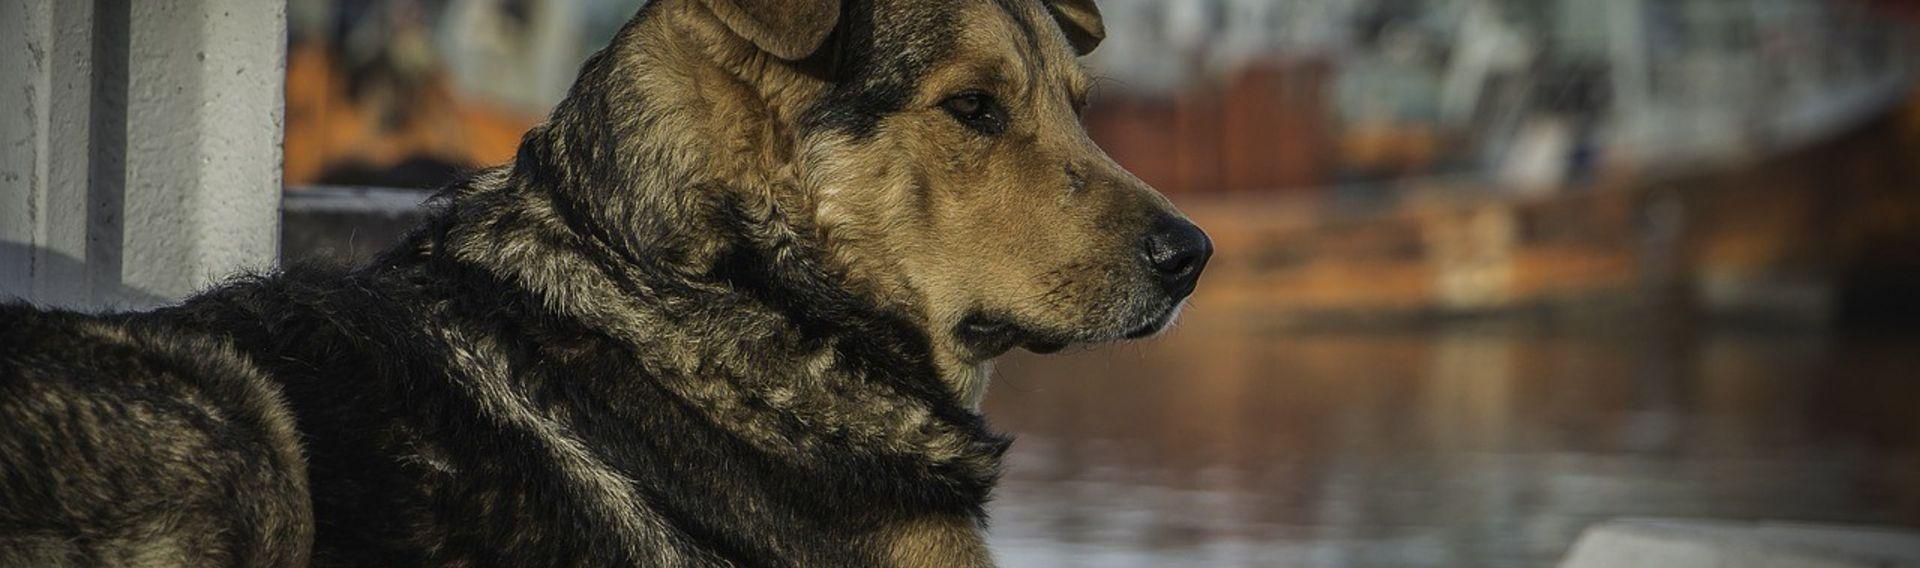 Kanutouren mit Hund – Das Hundekanu